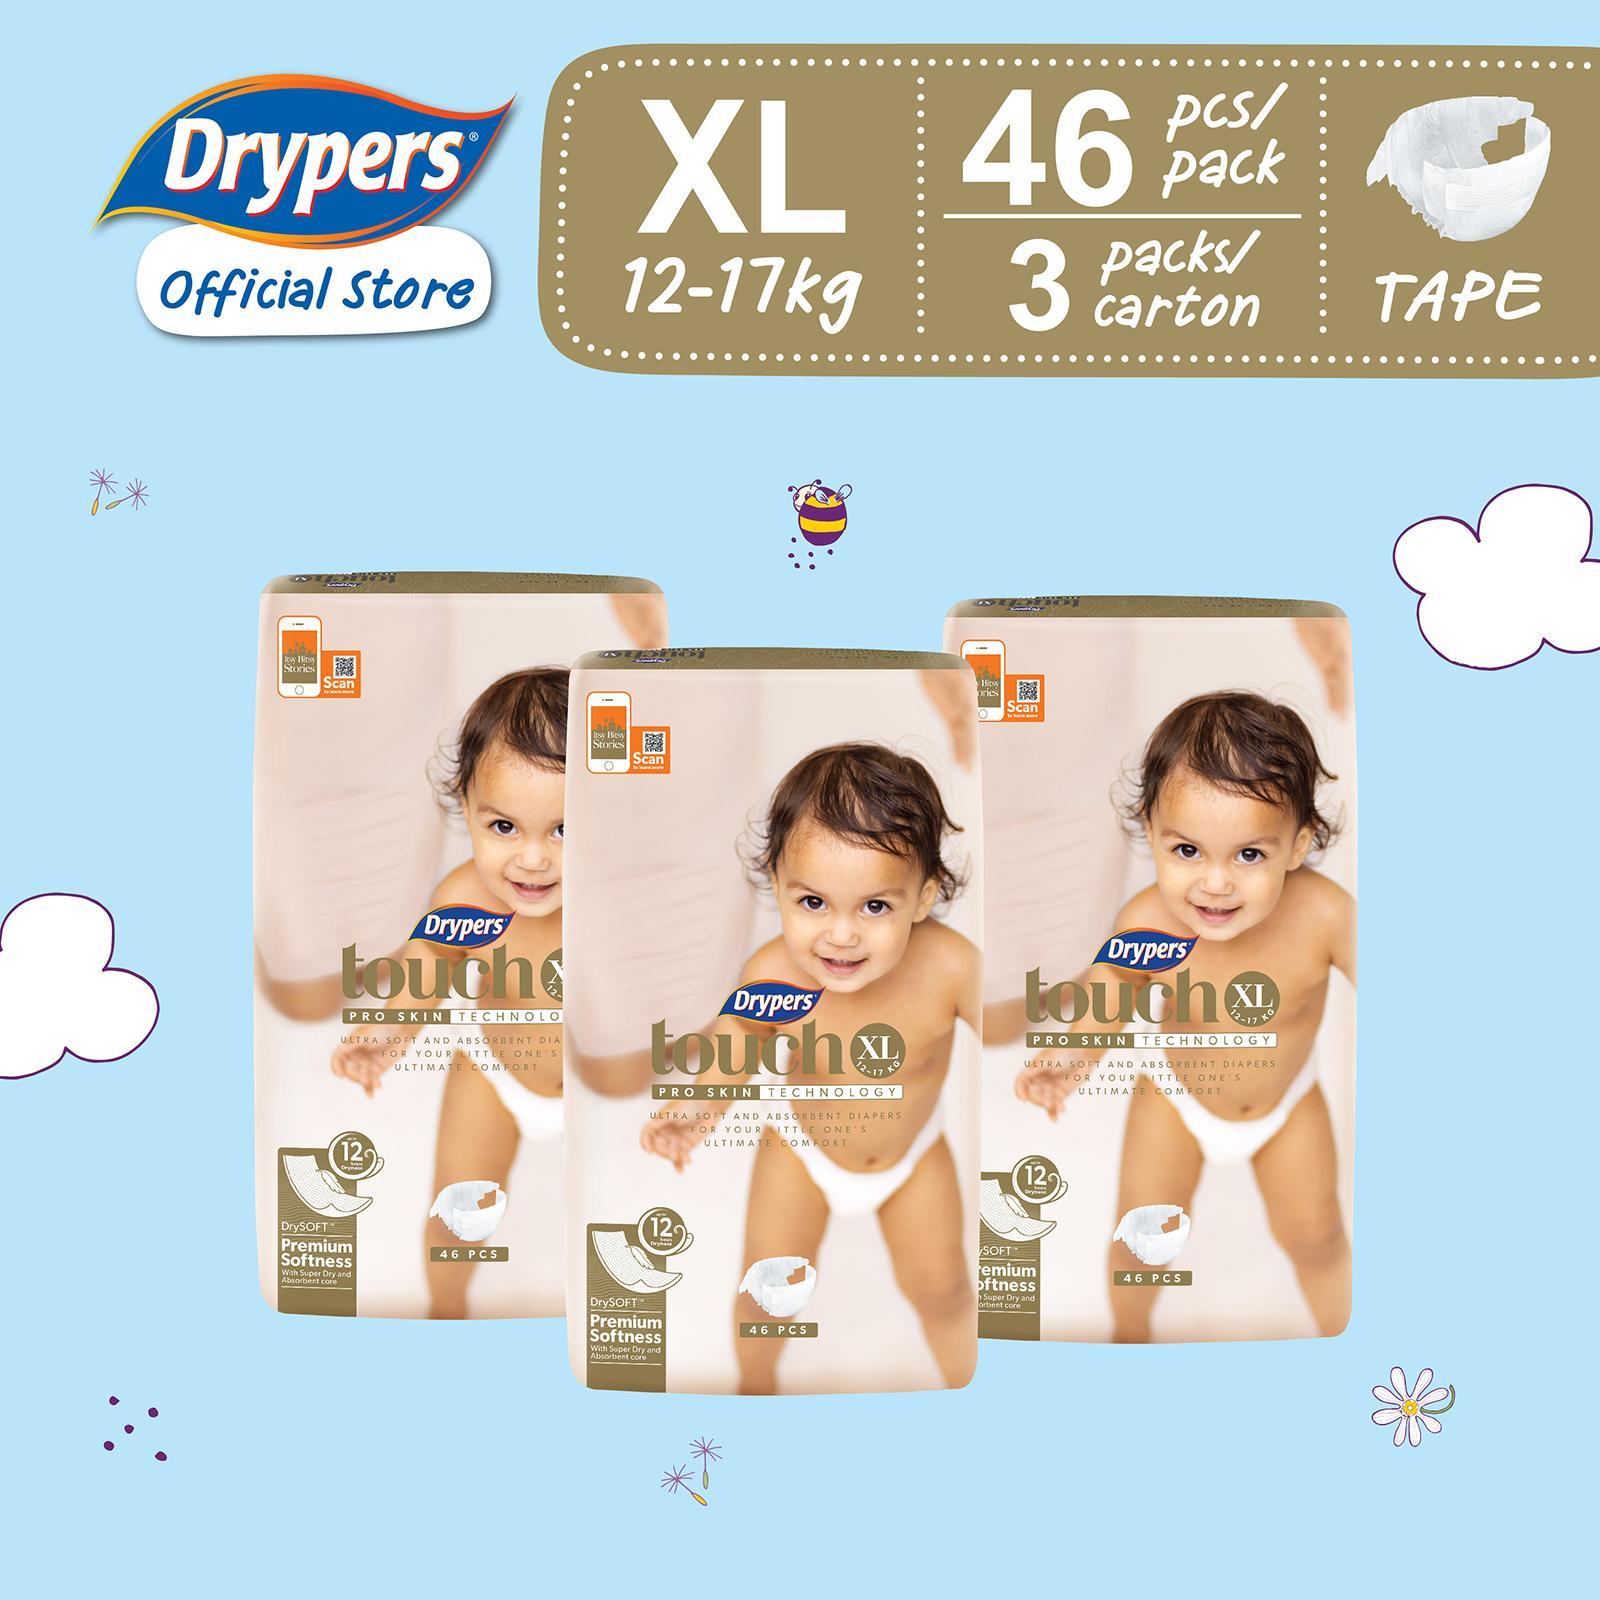 Drypers Touch XL (12 - 17kg) 46s x 3 packs 138pcs